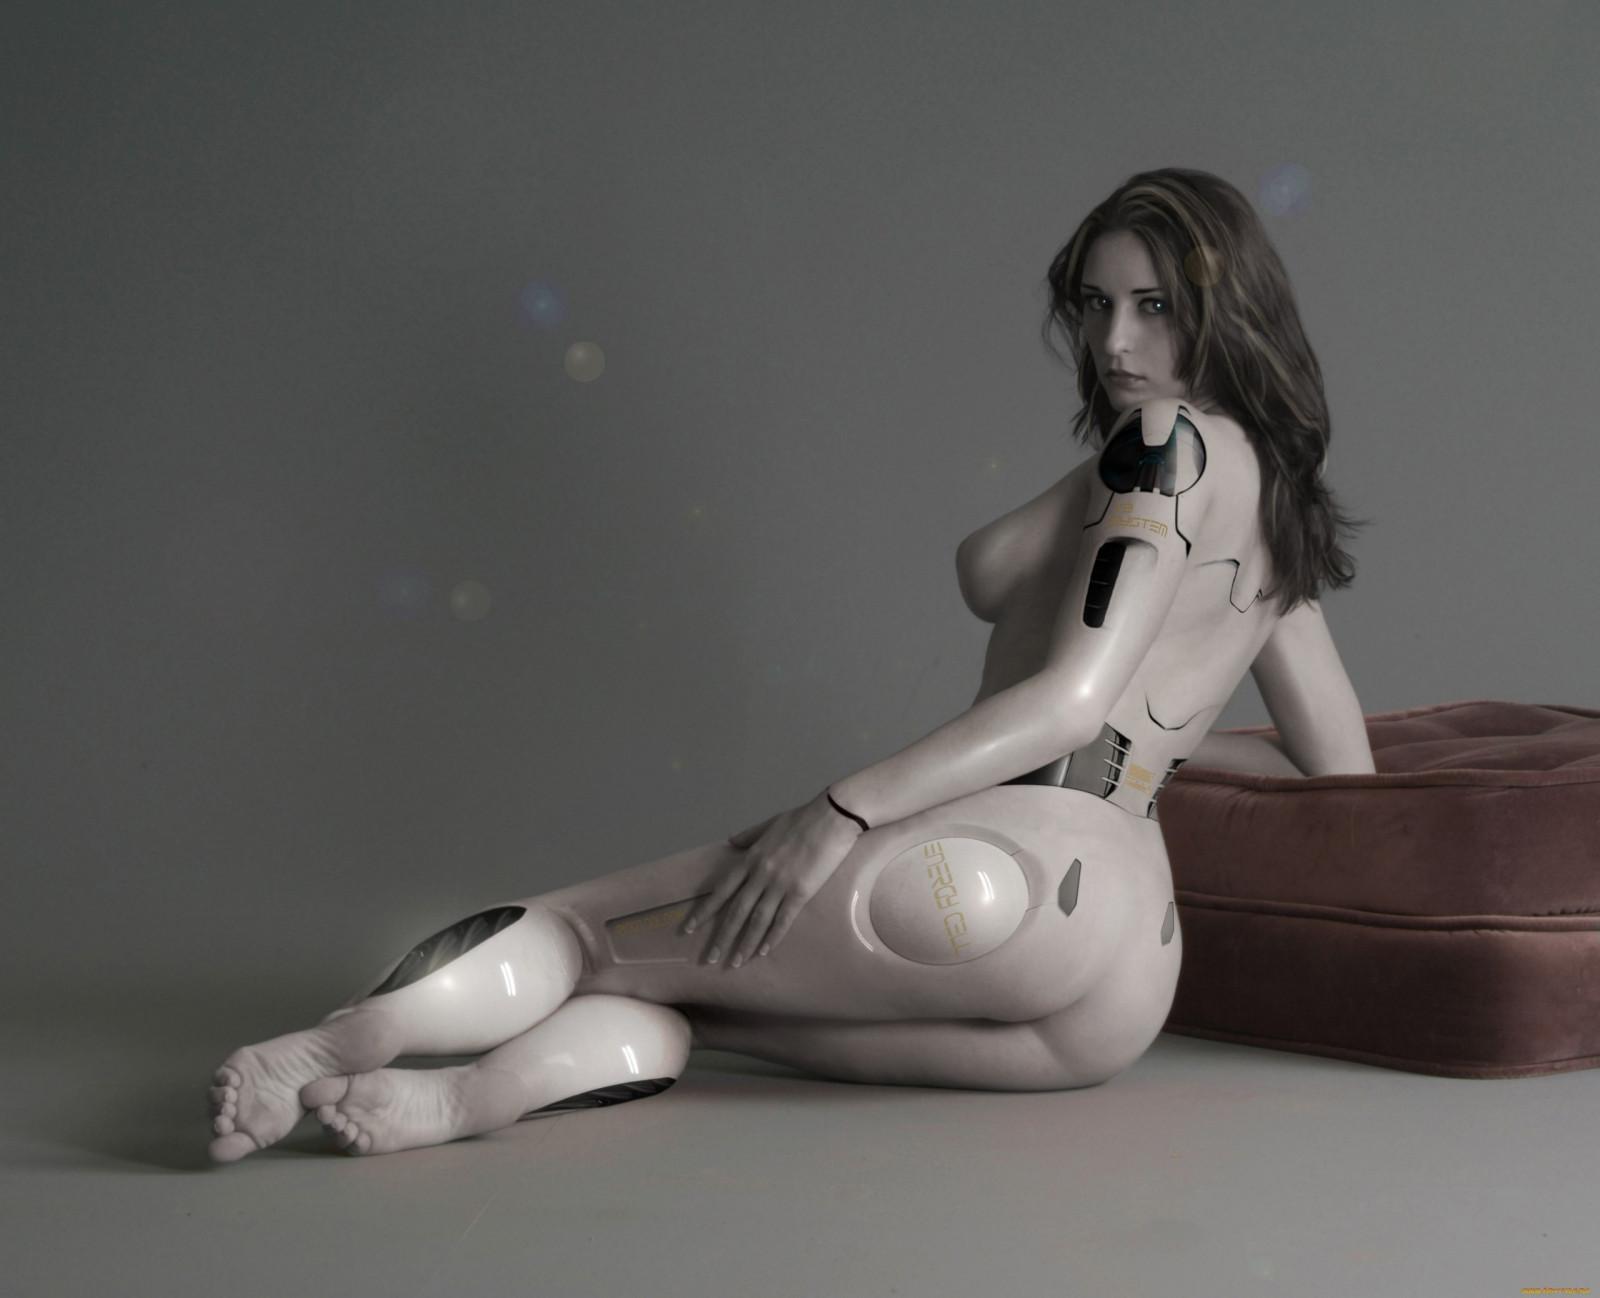 Amy robotic nude photos, free orgasm video mature